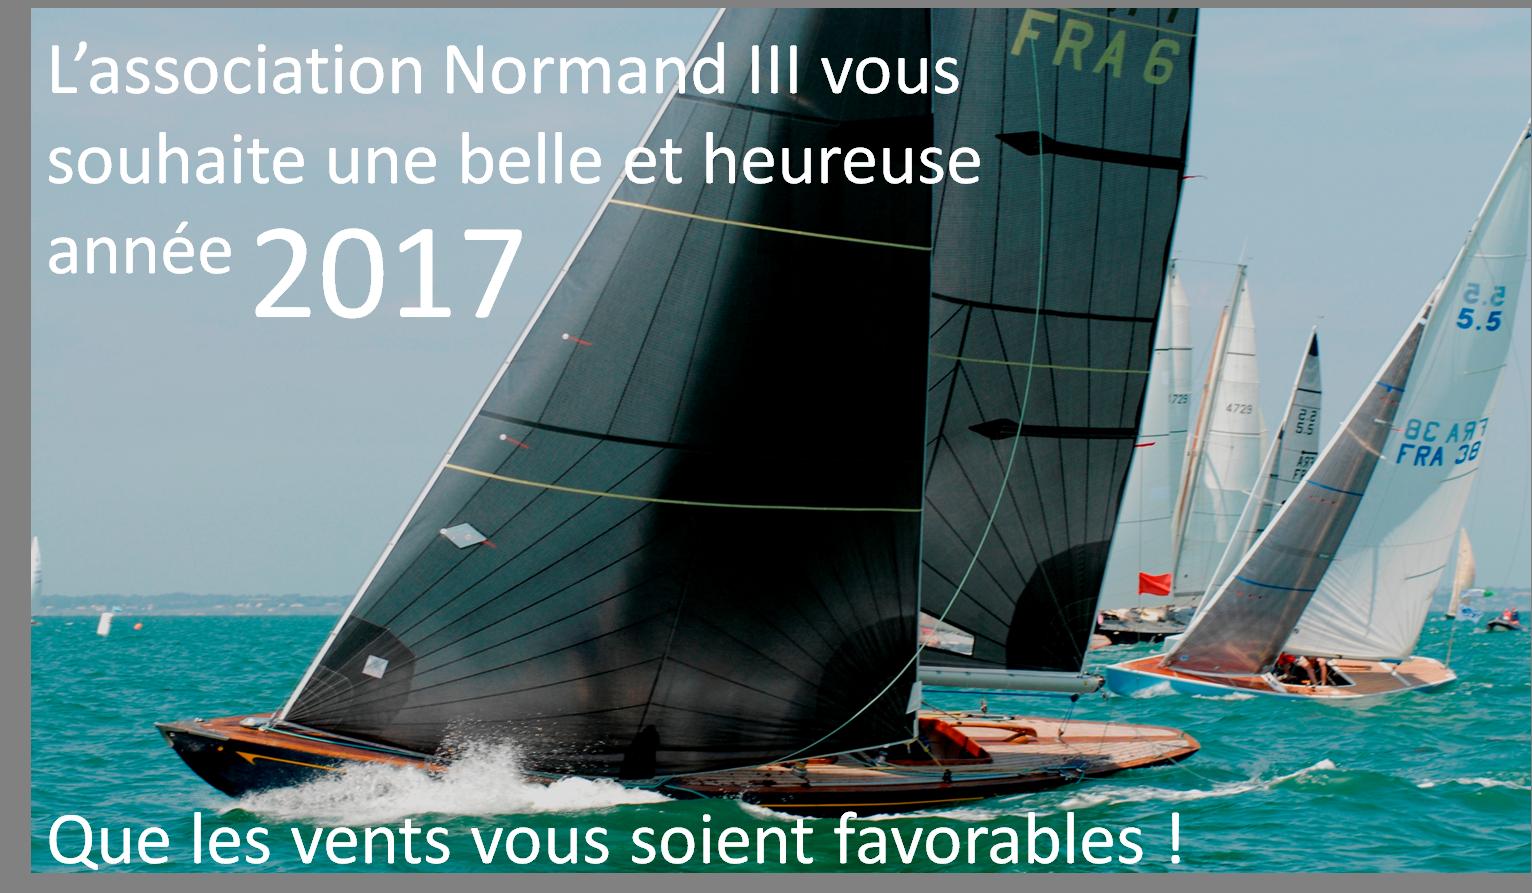 meilleurs-voeux-2017-normand-iii